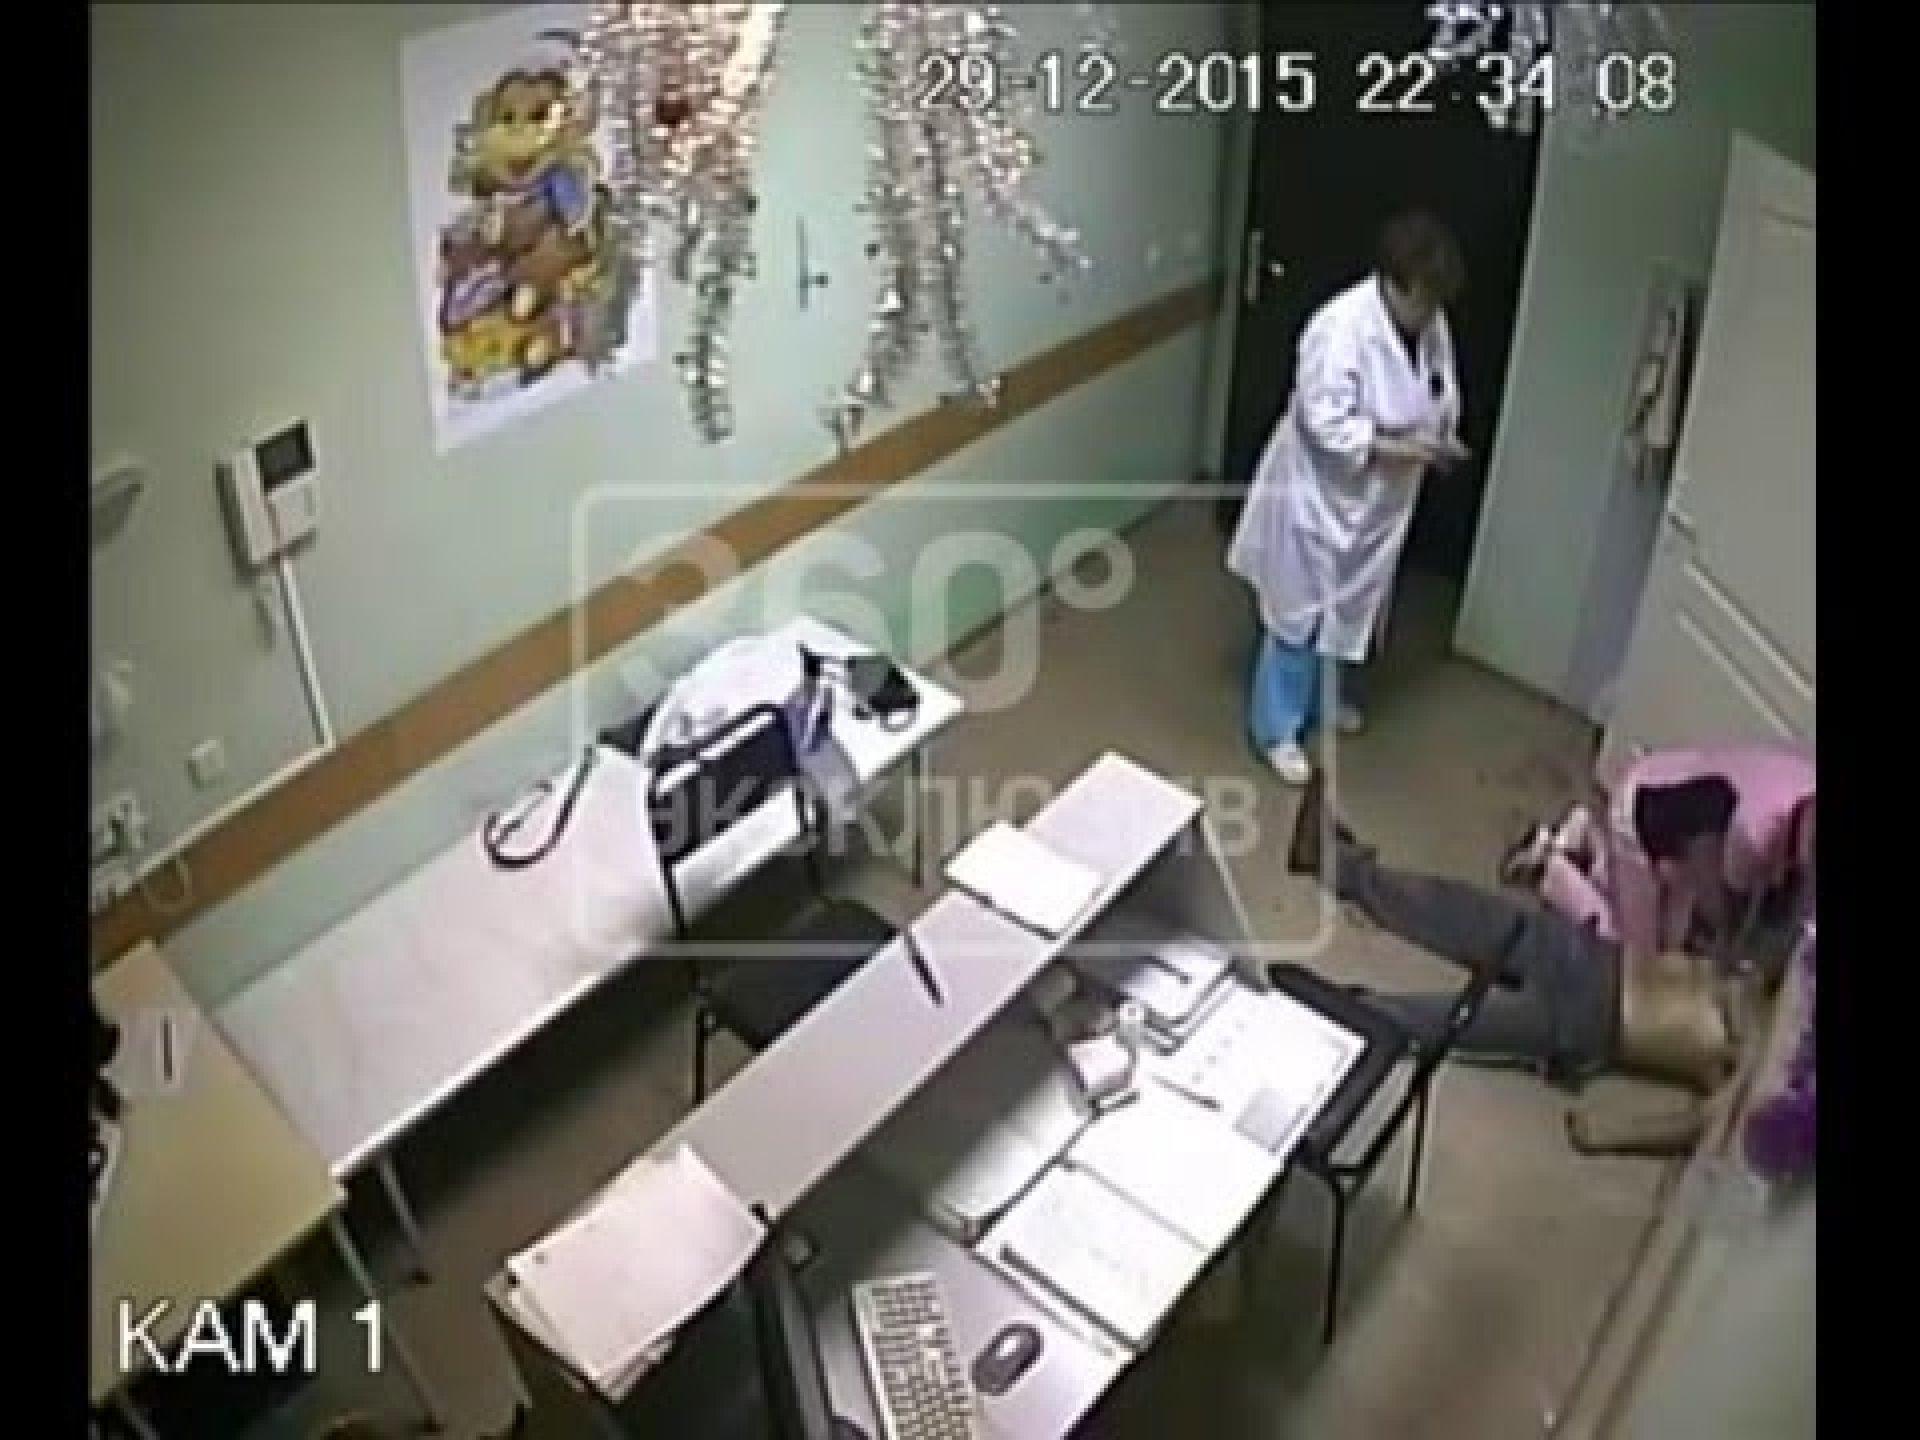 Трахнул медсестру у неё в кабинете, Клиент трахнул медсестру в кабинете 20 фотография